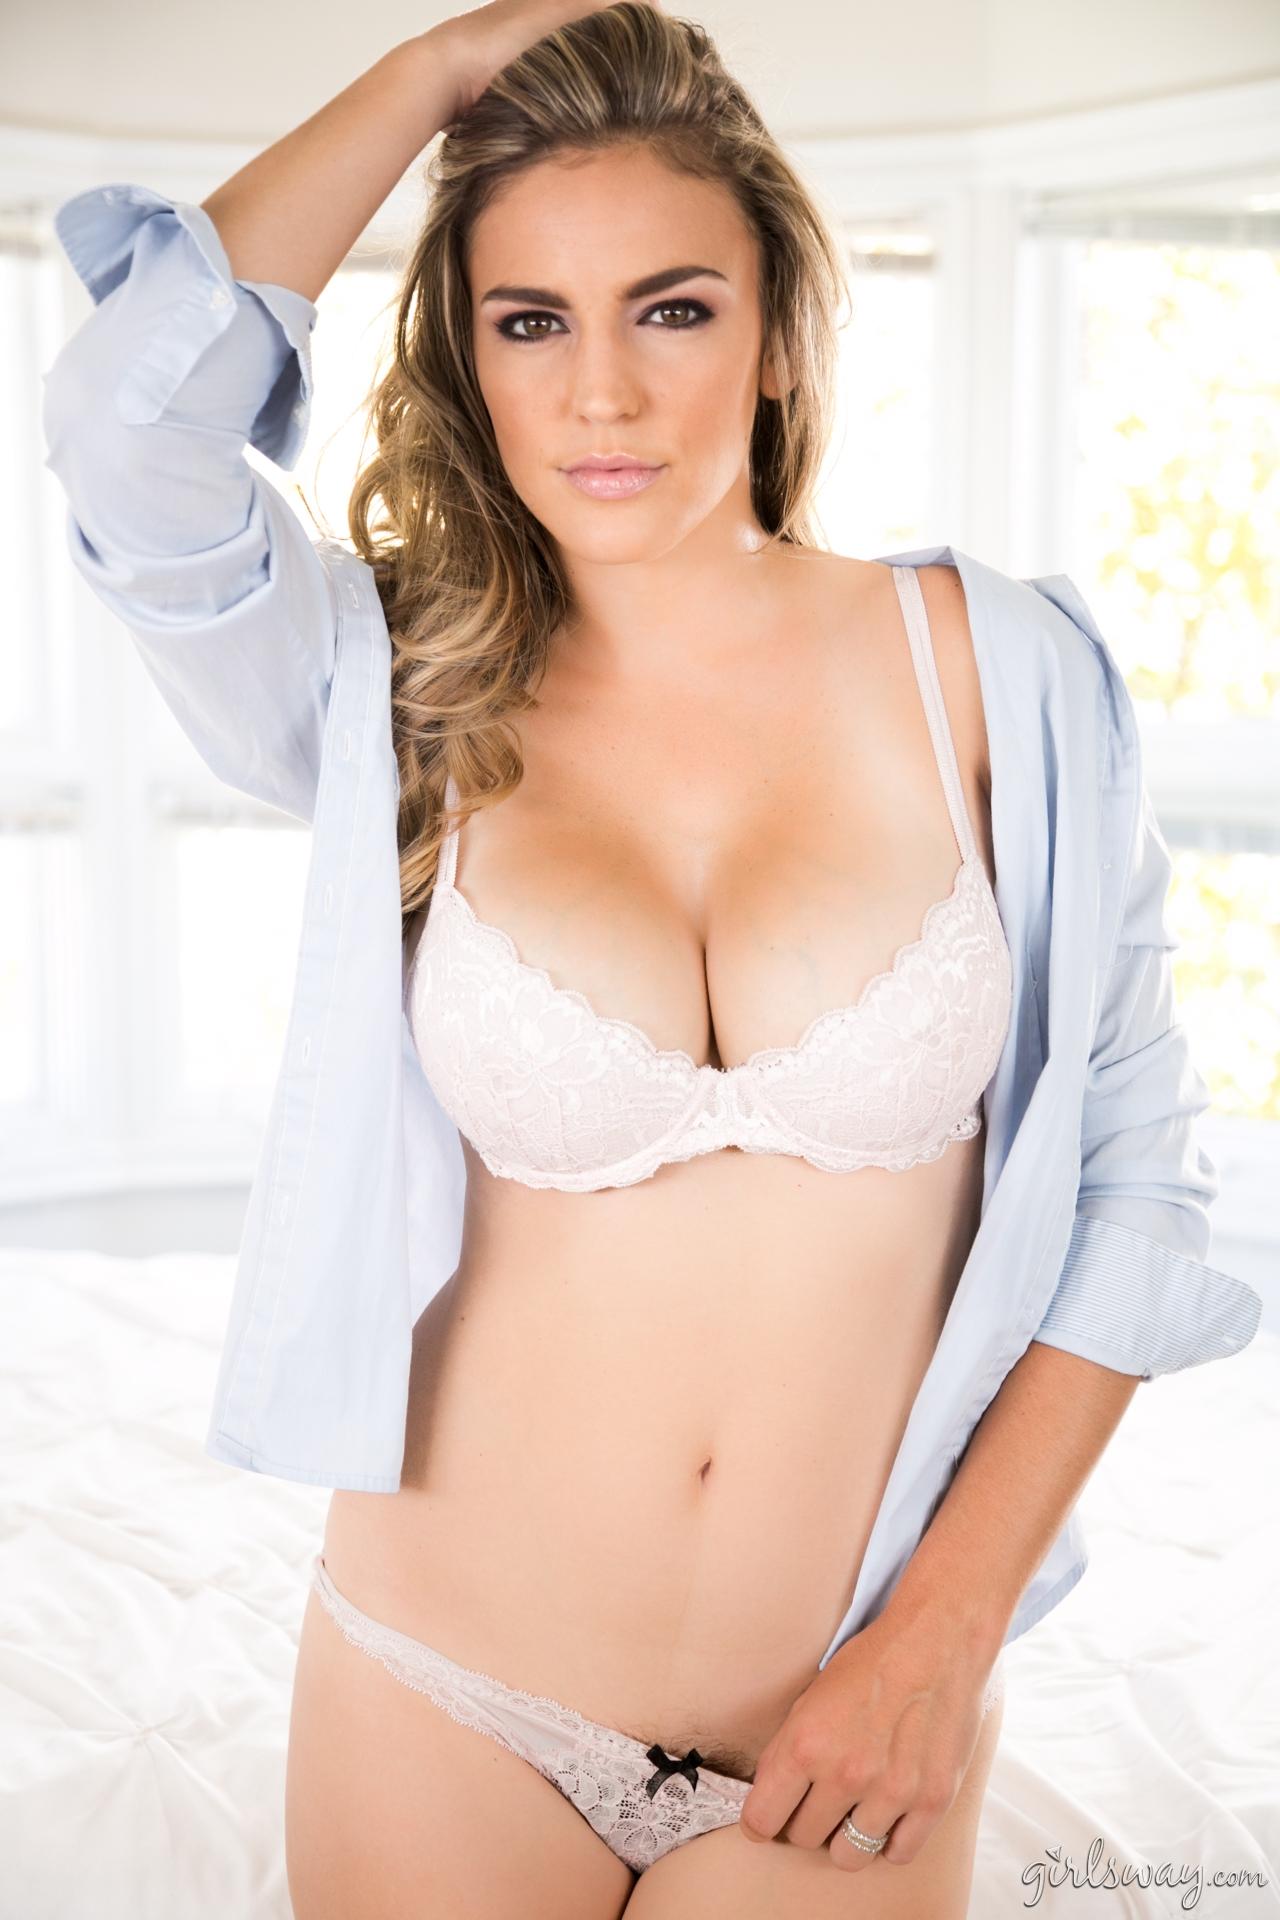 Ryan Ryans Big Tits Massage Masturbation And Public Nudity Compilation